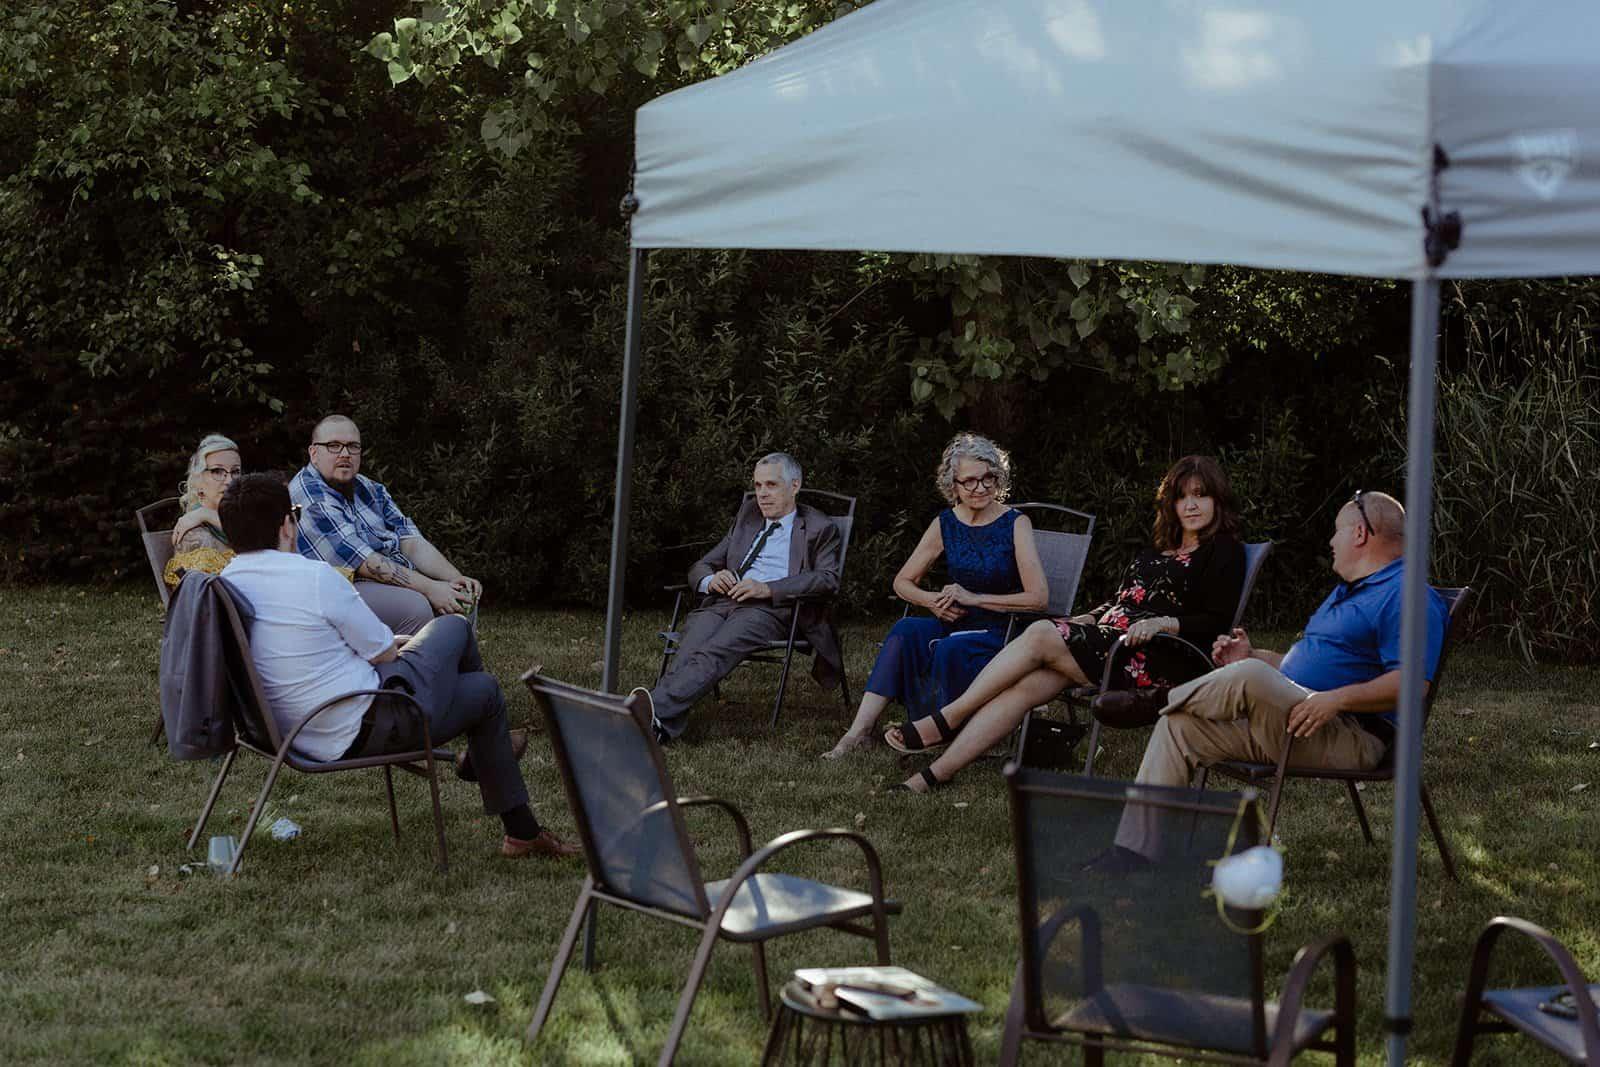 COVID-19 Backyard Wedding - WILLIAM + KAYLA 308